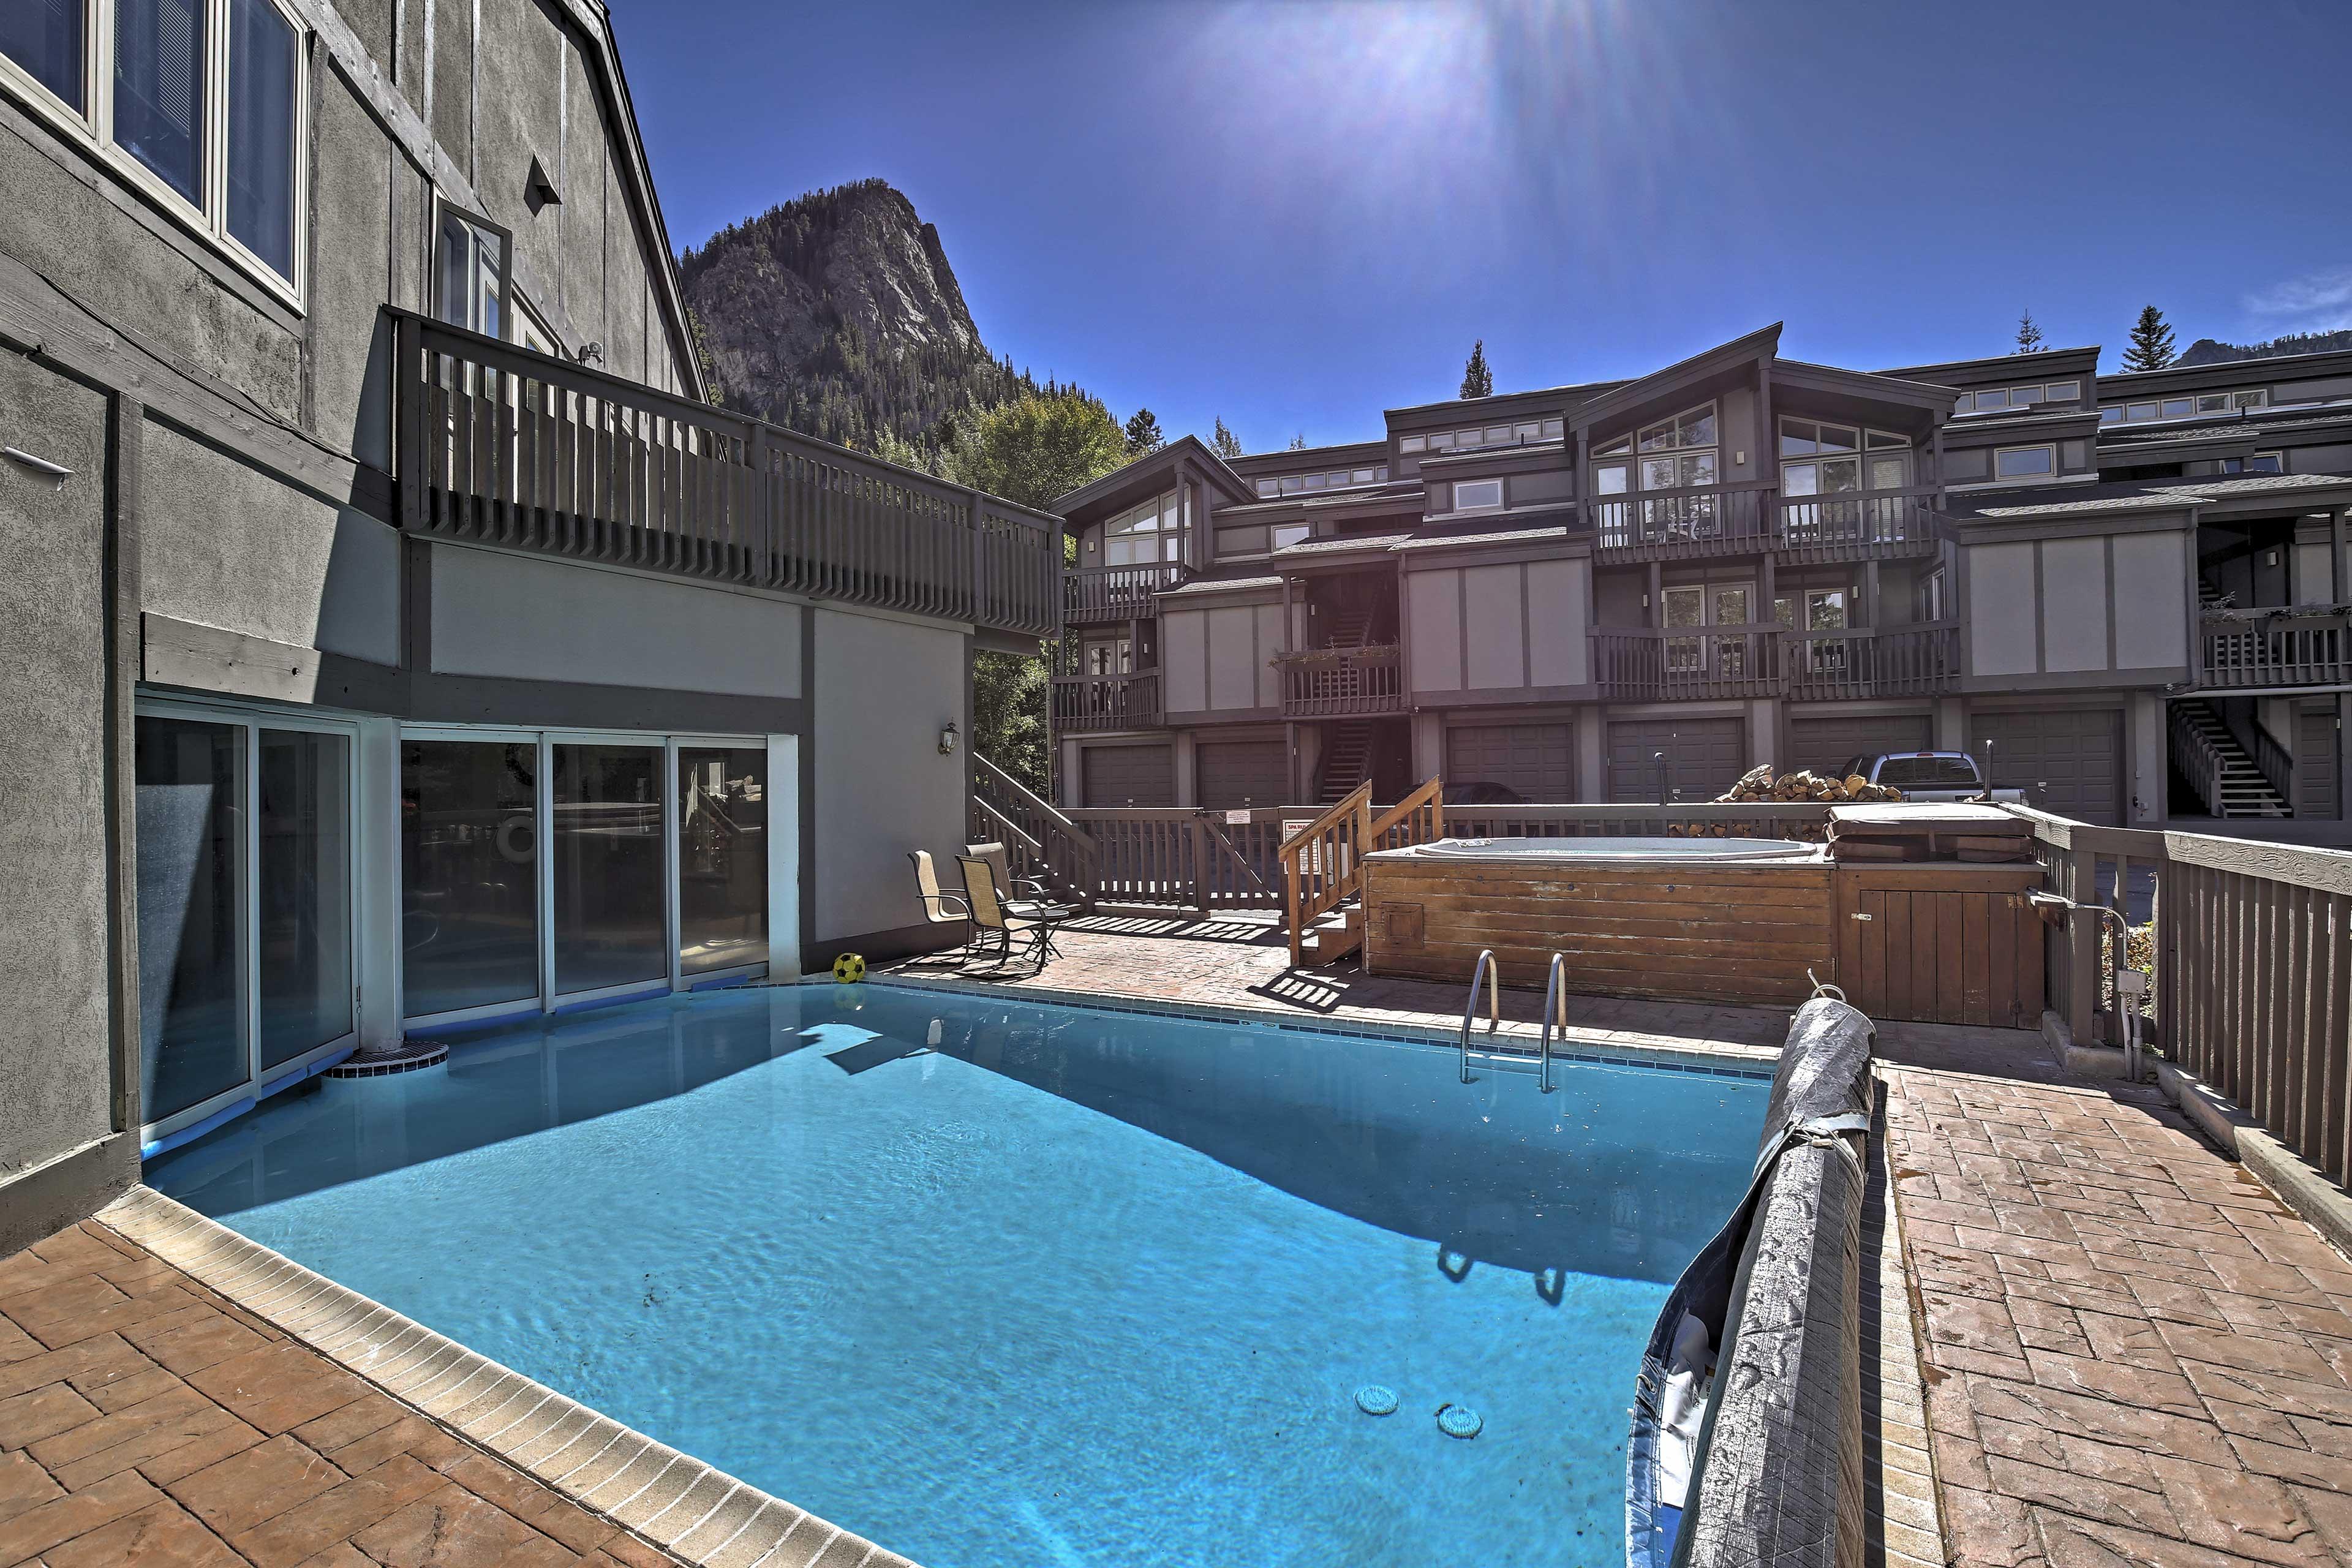 Take a dip in the pool or hot tub!